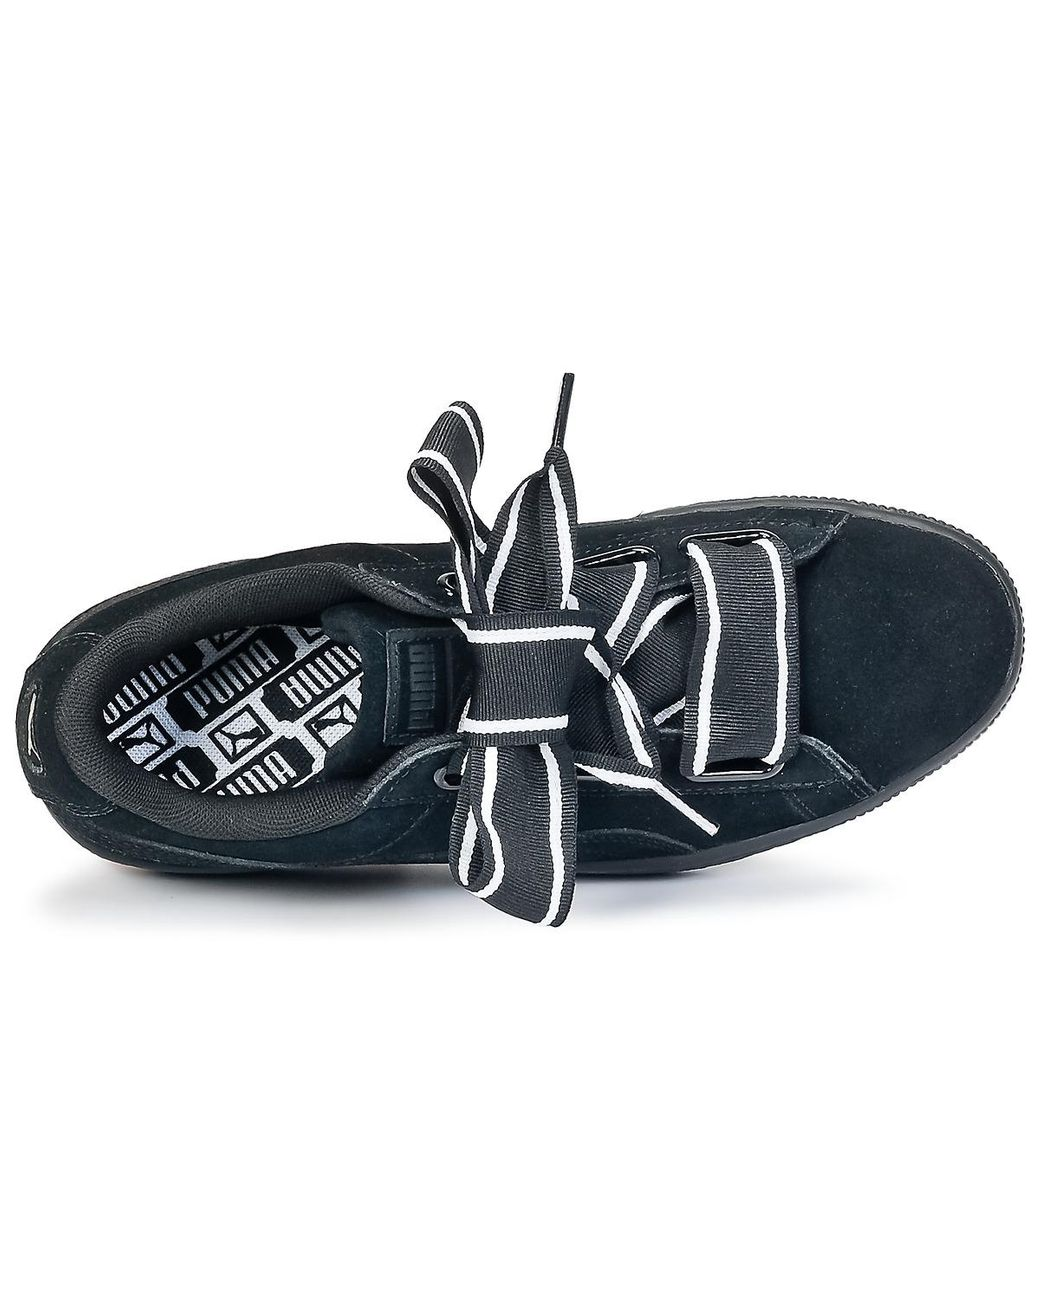 Puma Basket Satin Lyst Heart ShoestrainersIn Black v0Nwnm8O